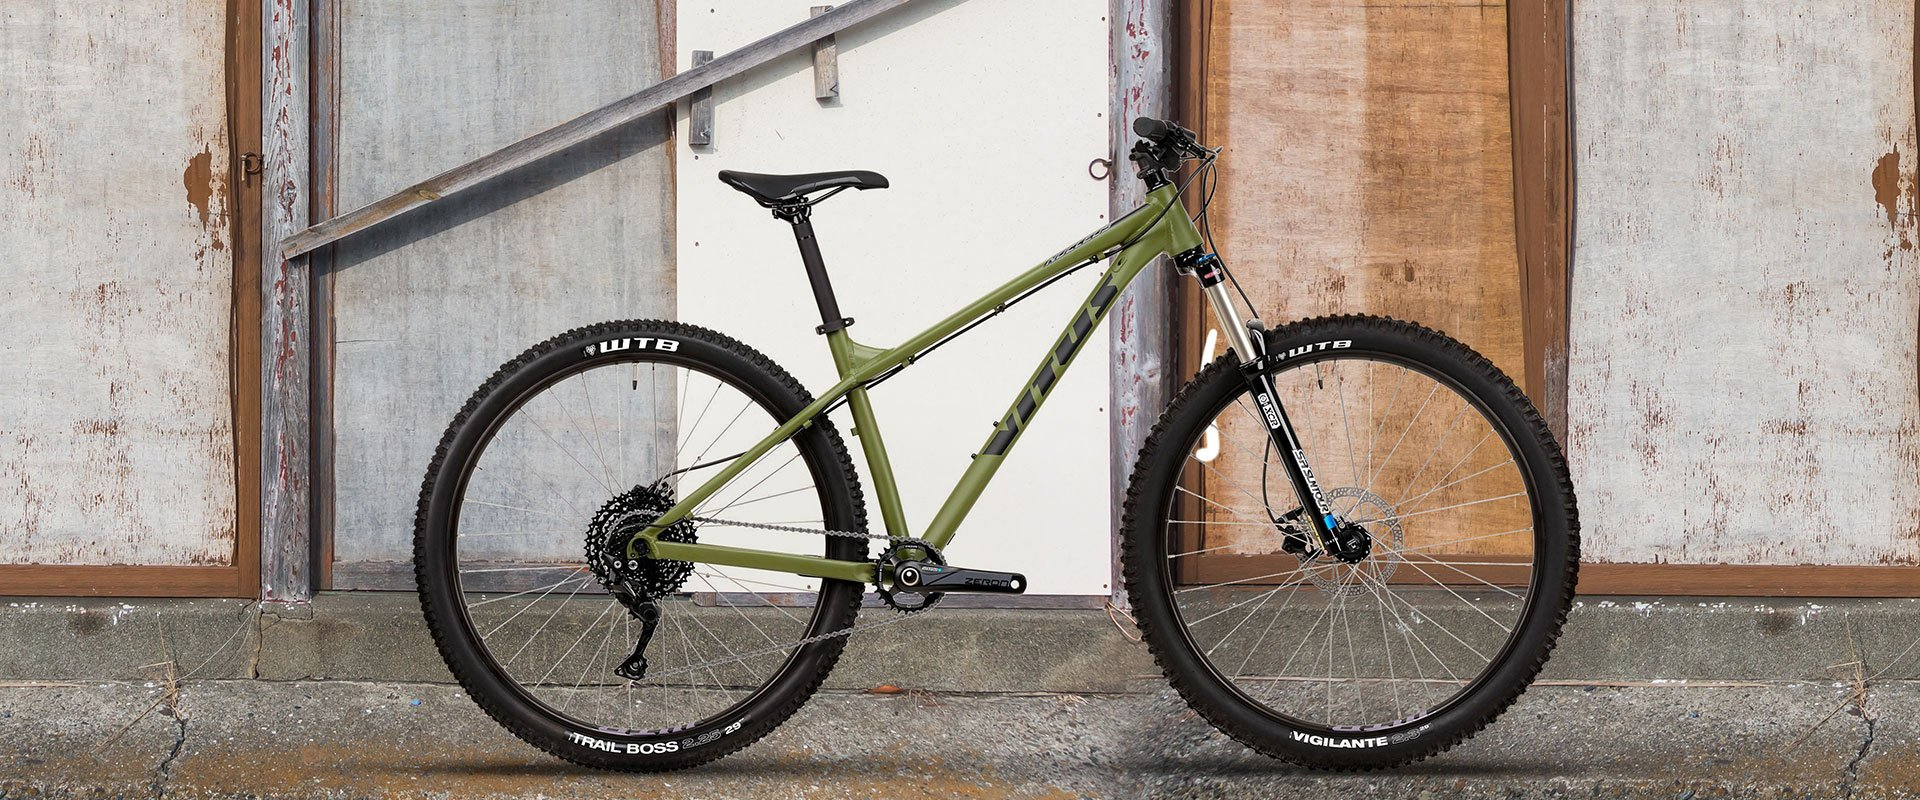 Nucleus 27 VRS Bike Deore 1x10